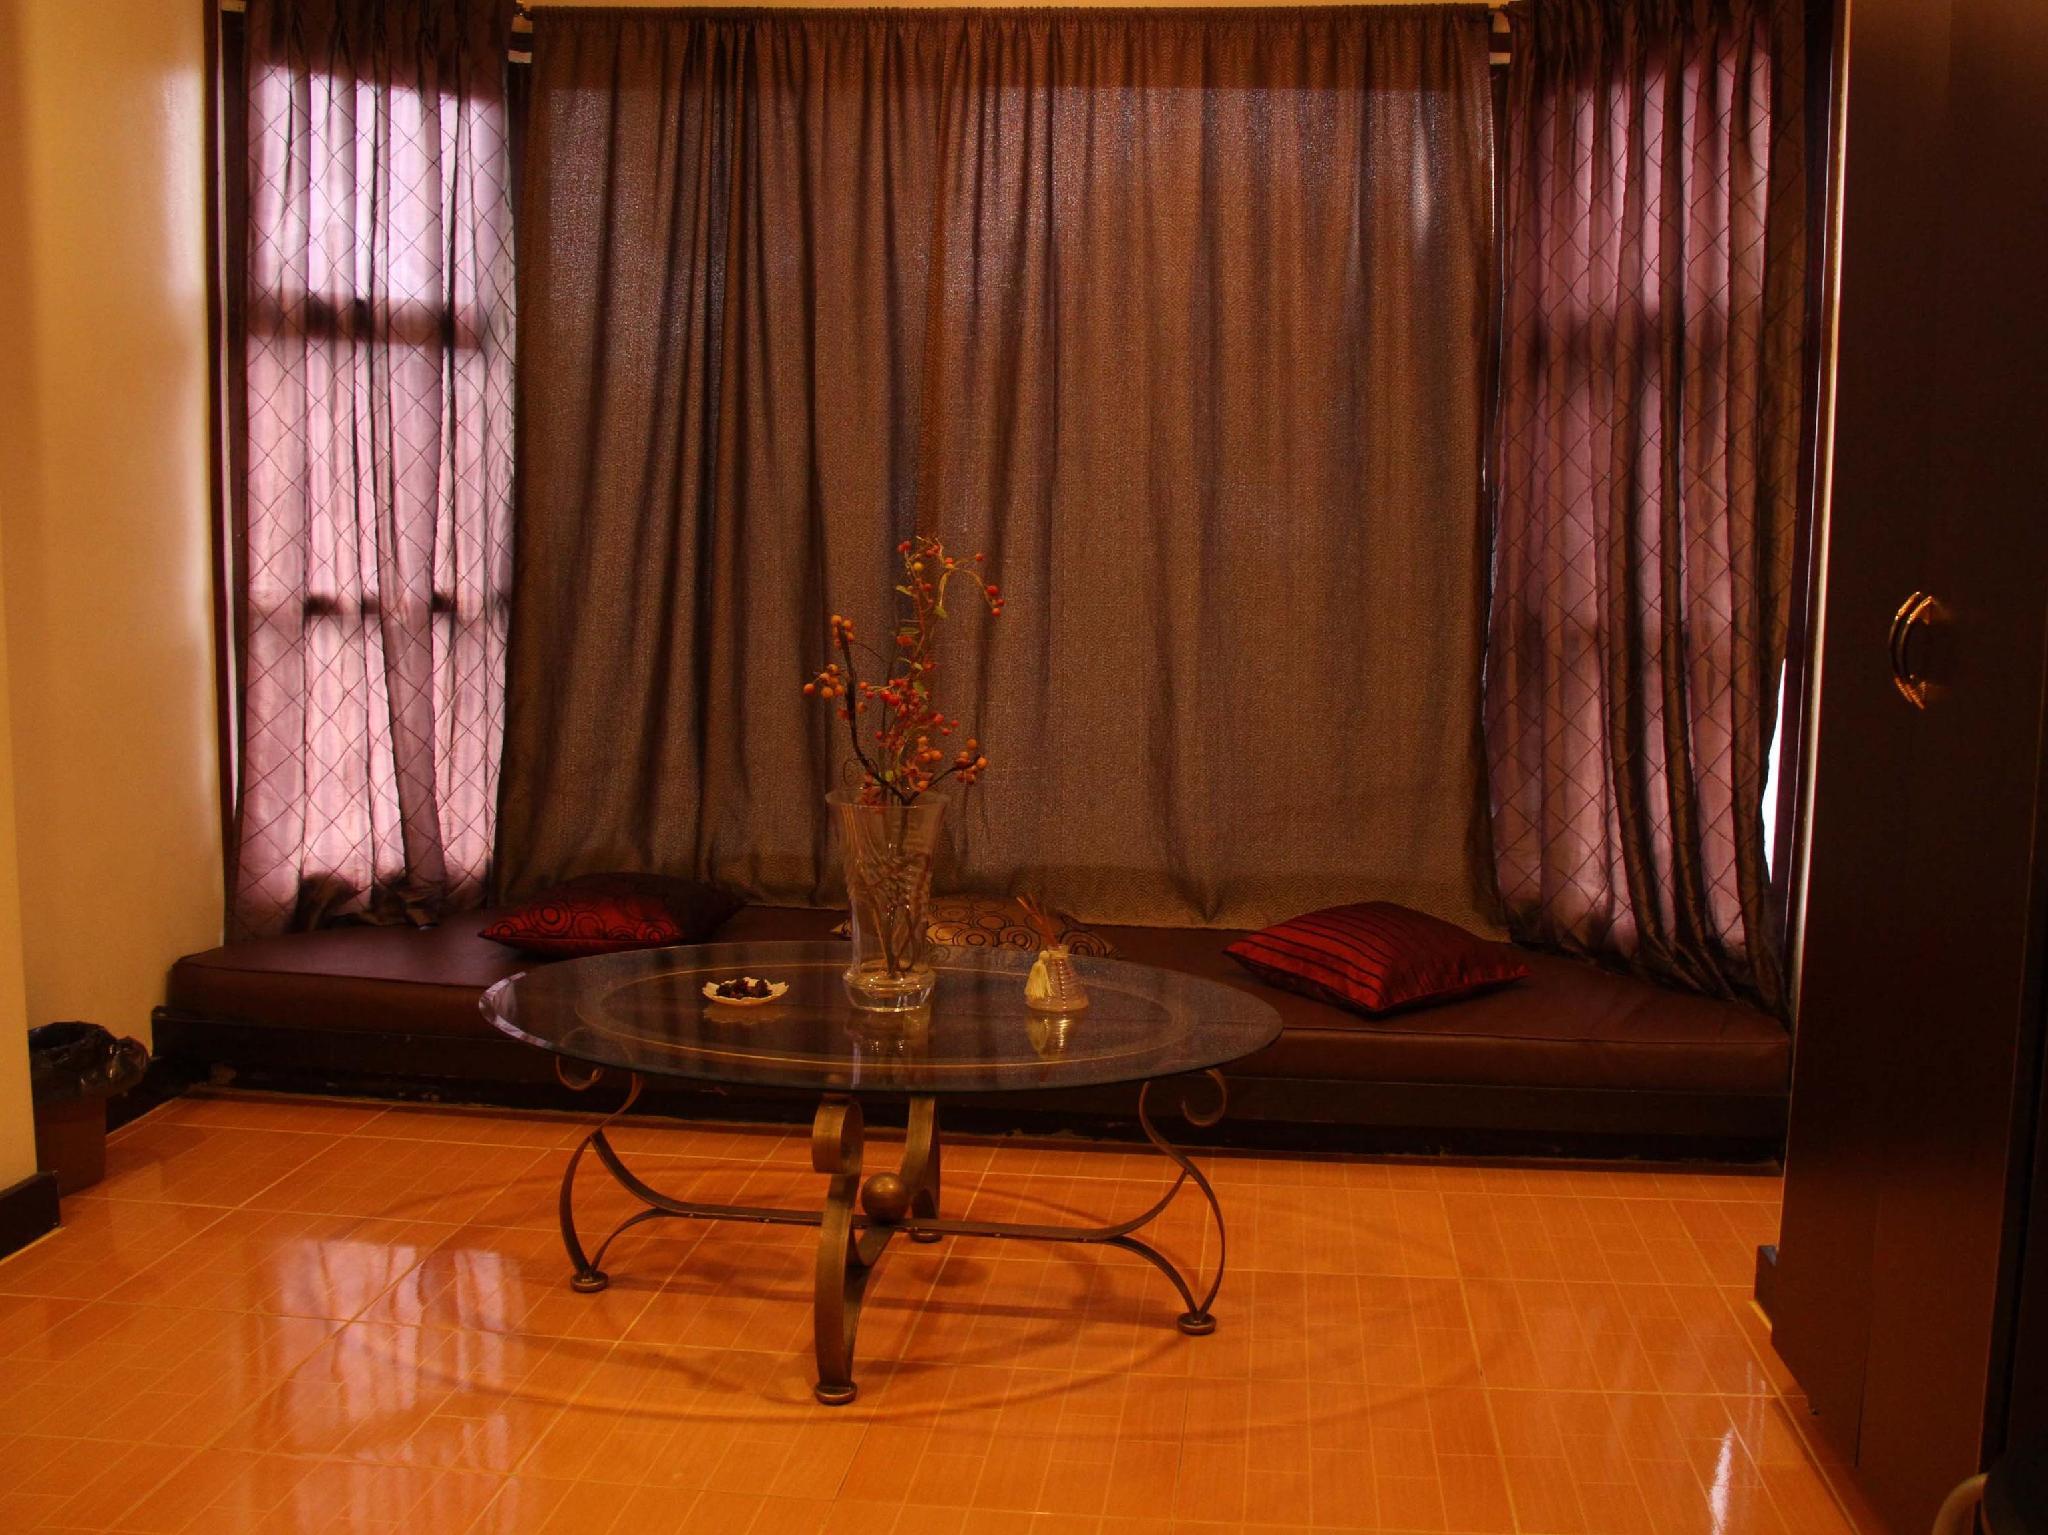 Twin Pines Casino Room Rates